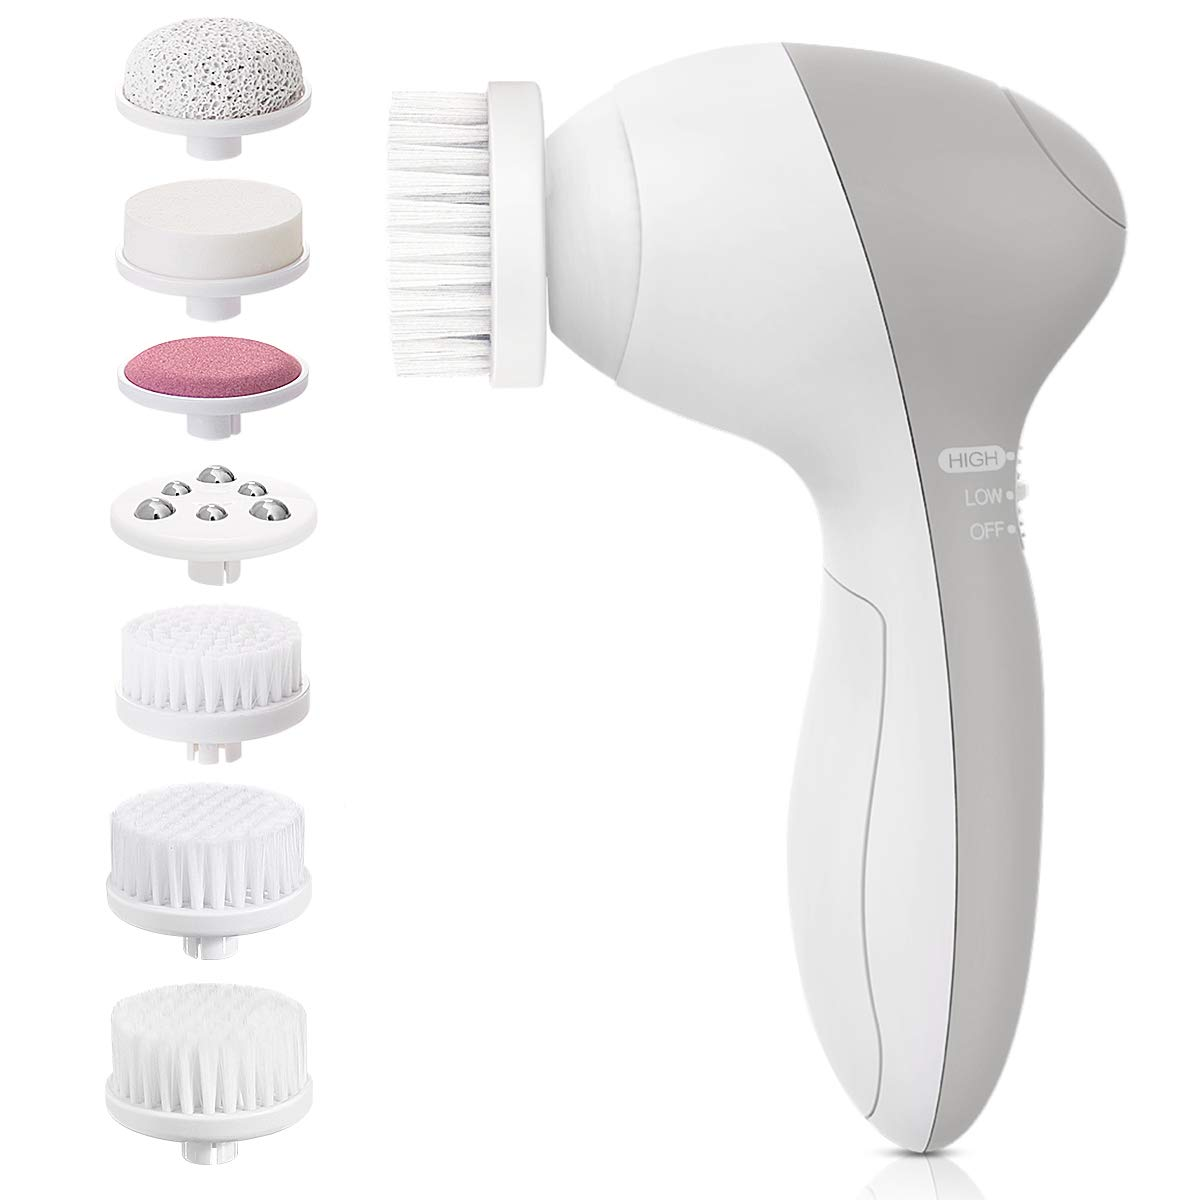 Facial Brush, Waterproof Facial Cleansing Brush with 7 Exfoliating Brush Heads - Silver Grey